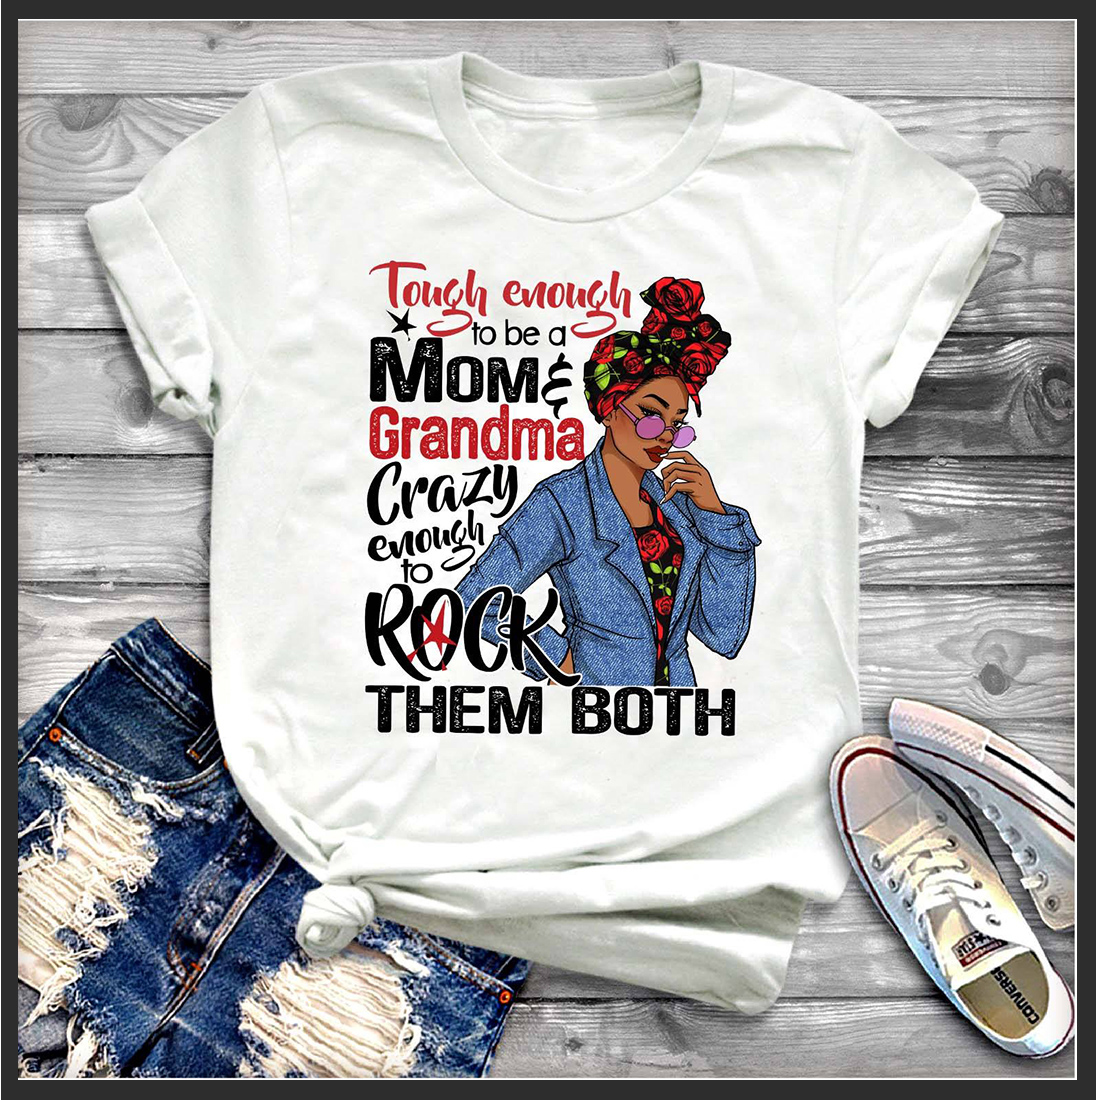 Tough enough to be a mom grandma crazy enough to rick them both shirt